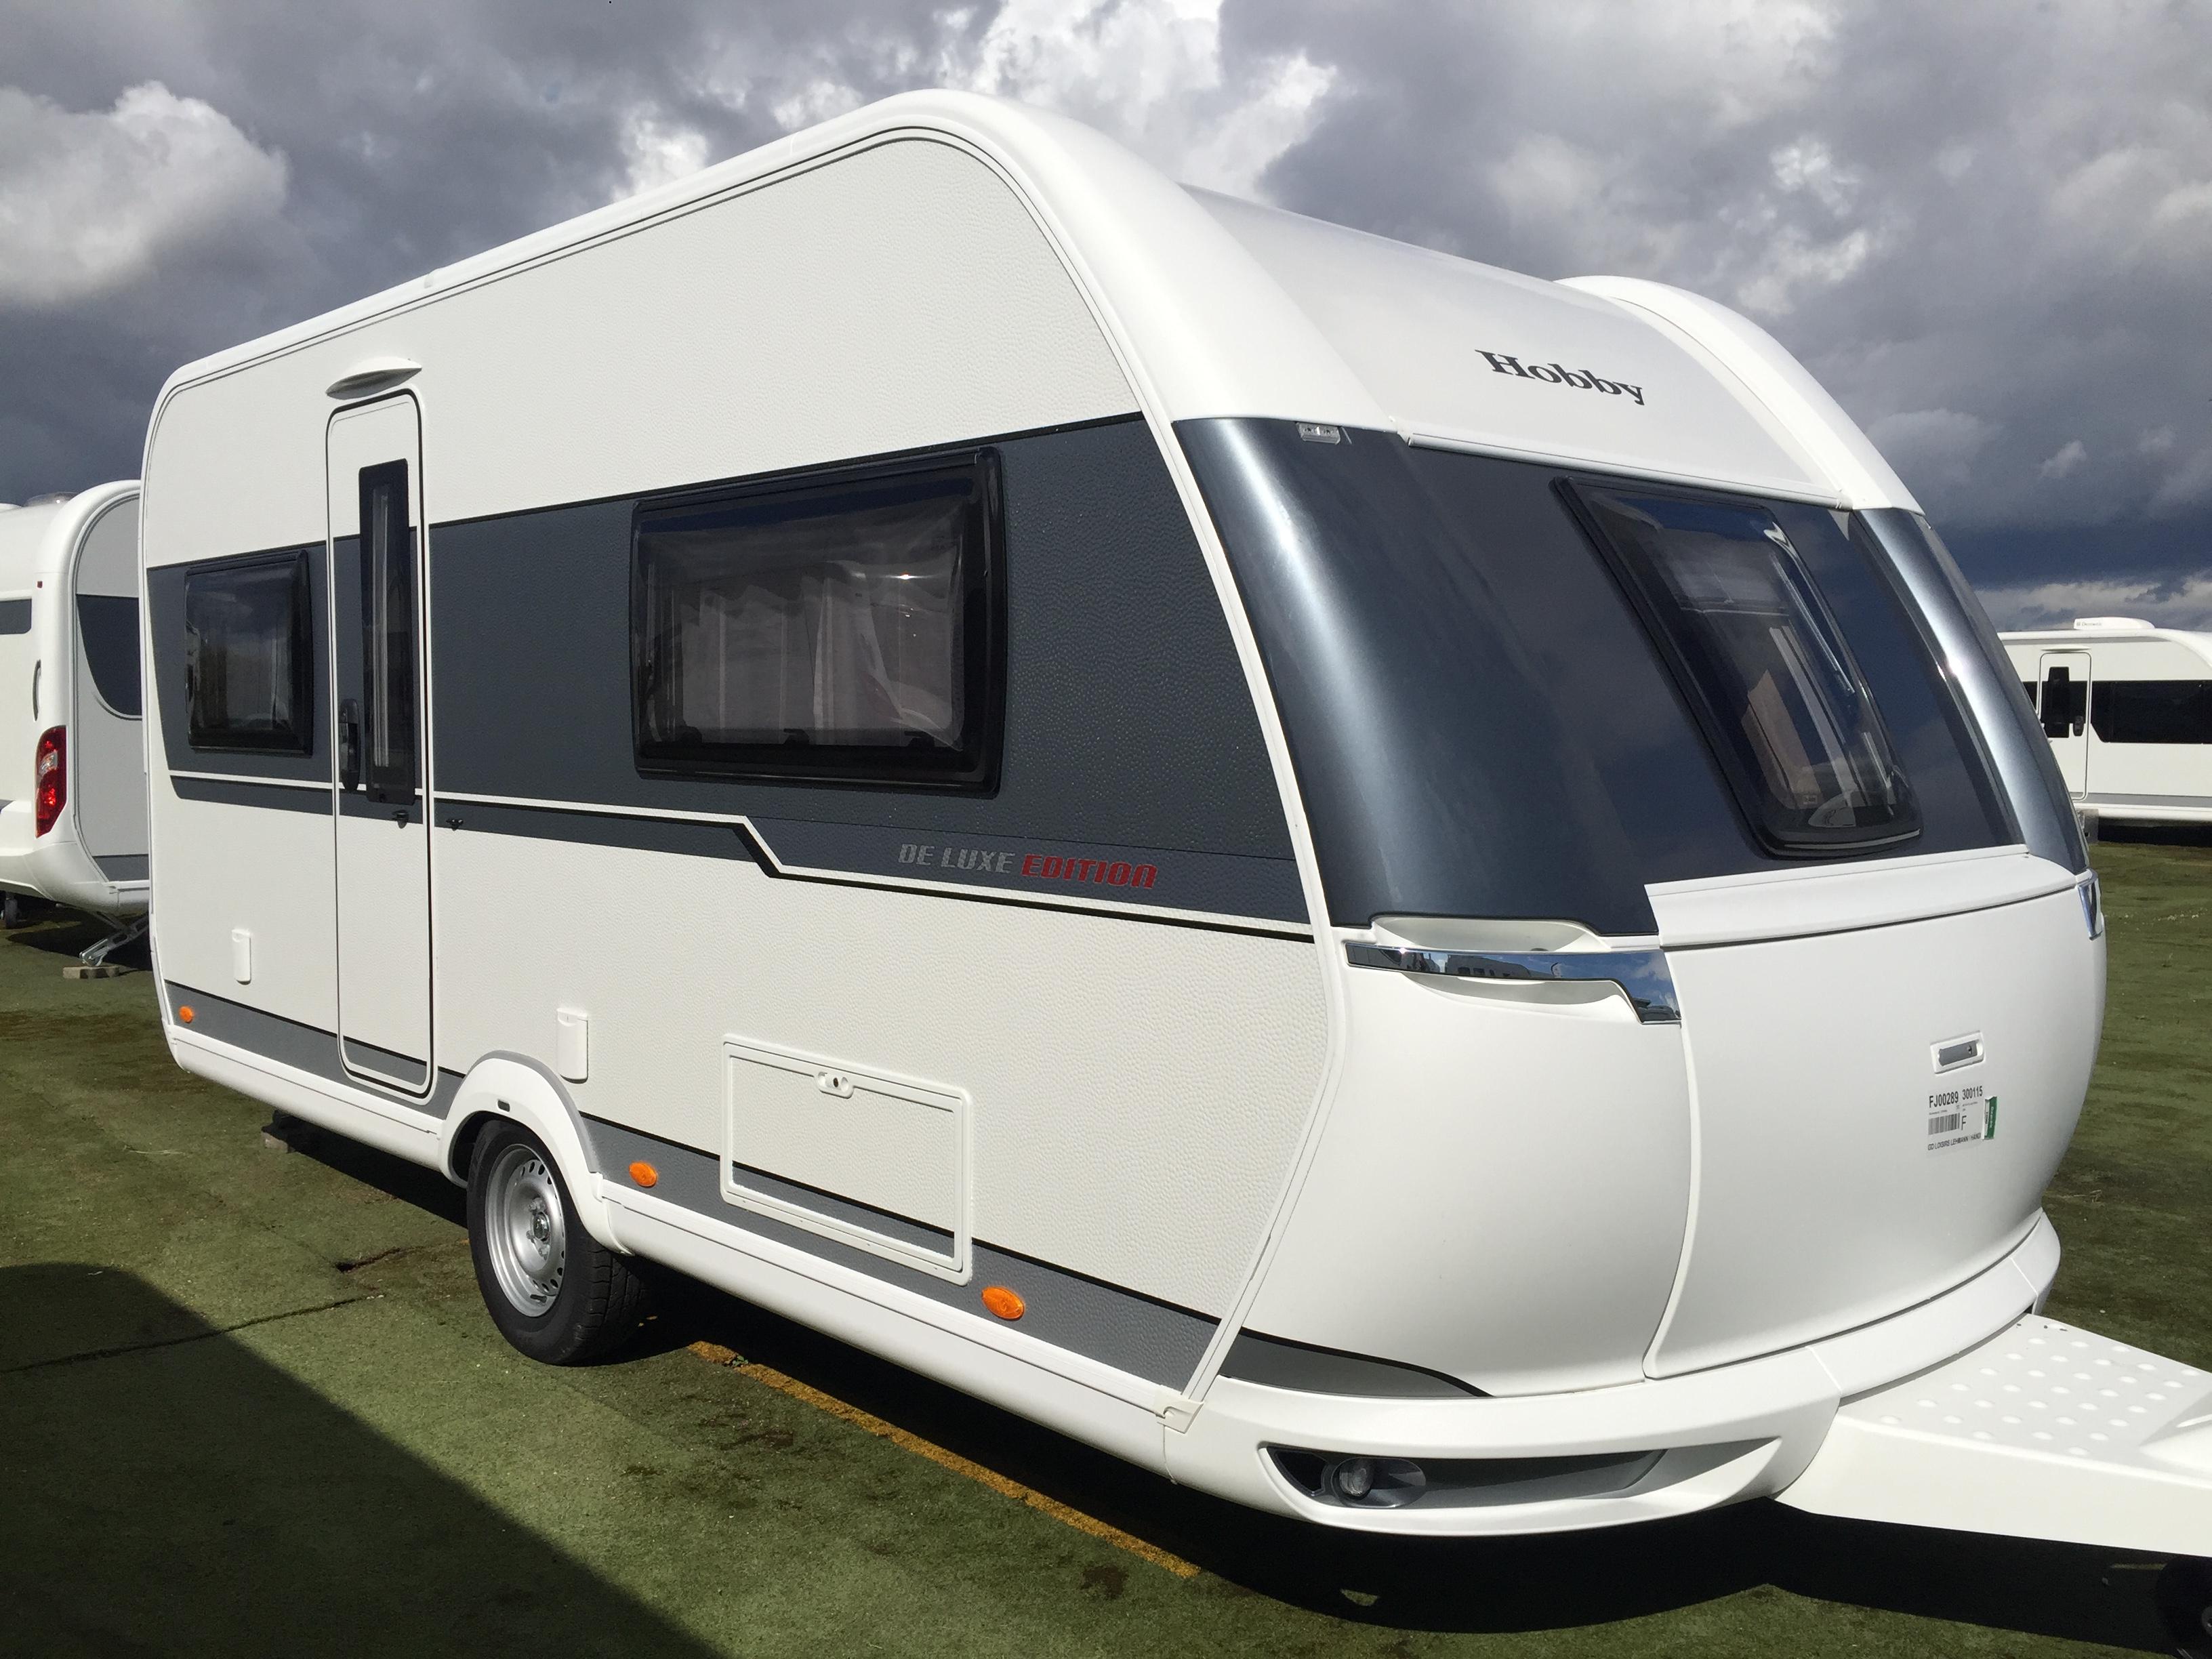 hobby 460 ufe de luxe edition neuf de 2018 caravane en vente oberschaeffolsheim rhin 67. Black Bedroom Furniture Sets. Home Design Ideas